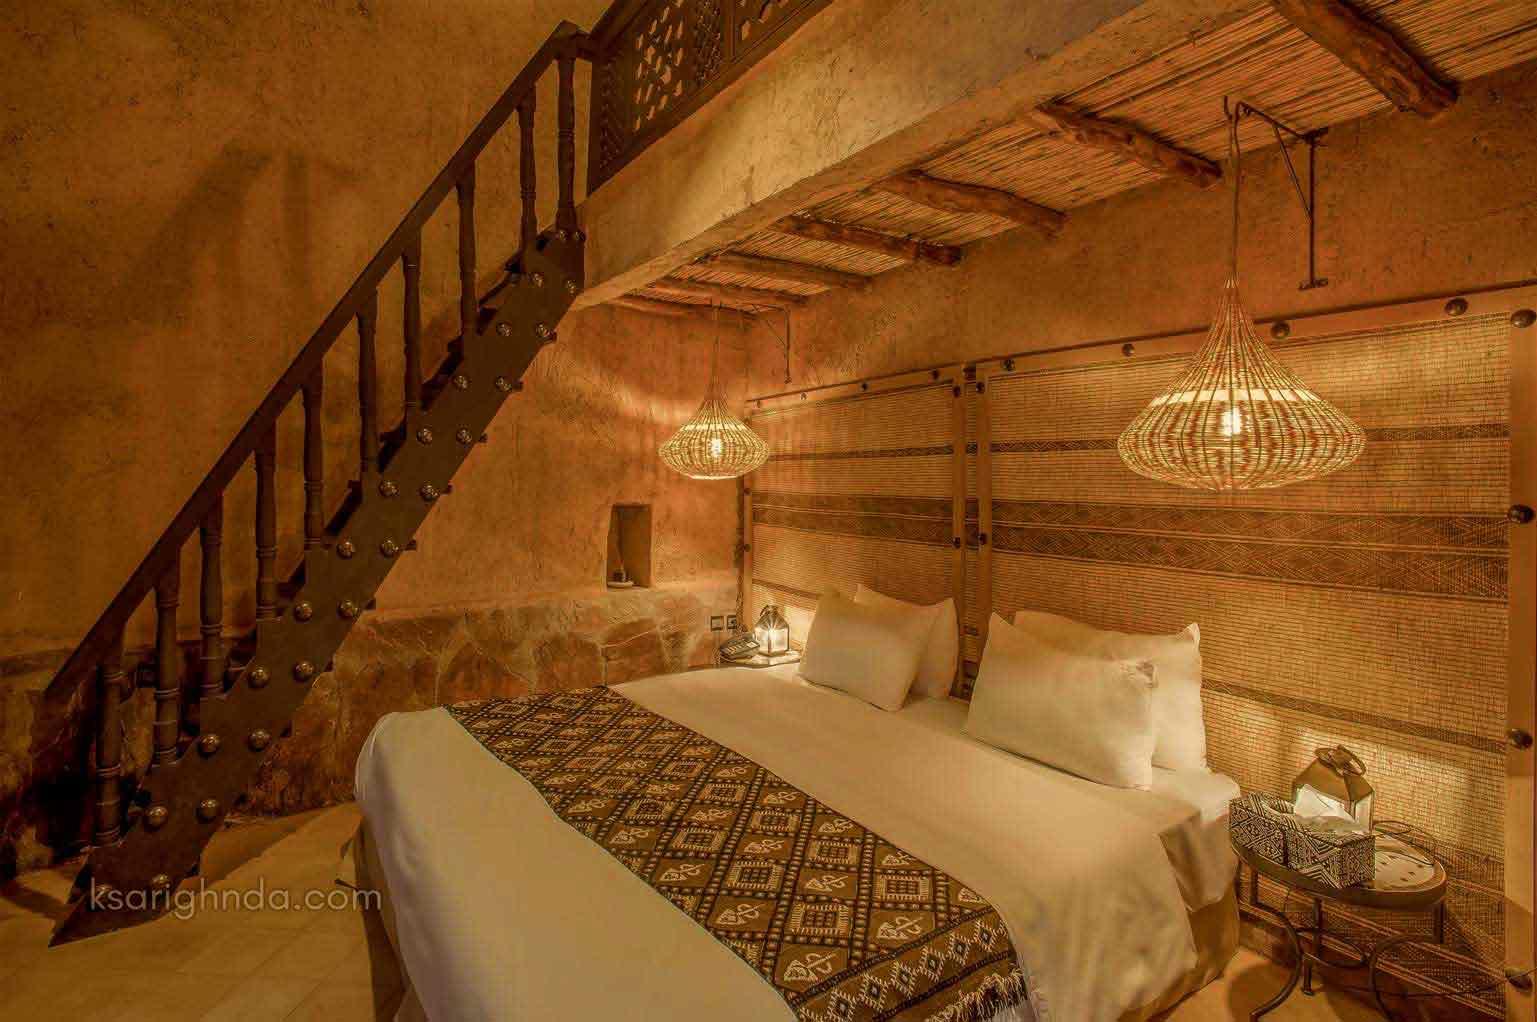 Chambre confort Hôtel ksar Ighnda